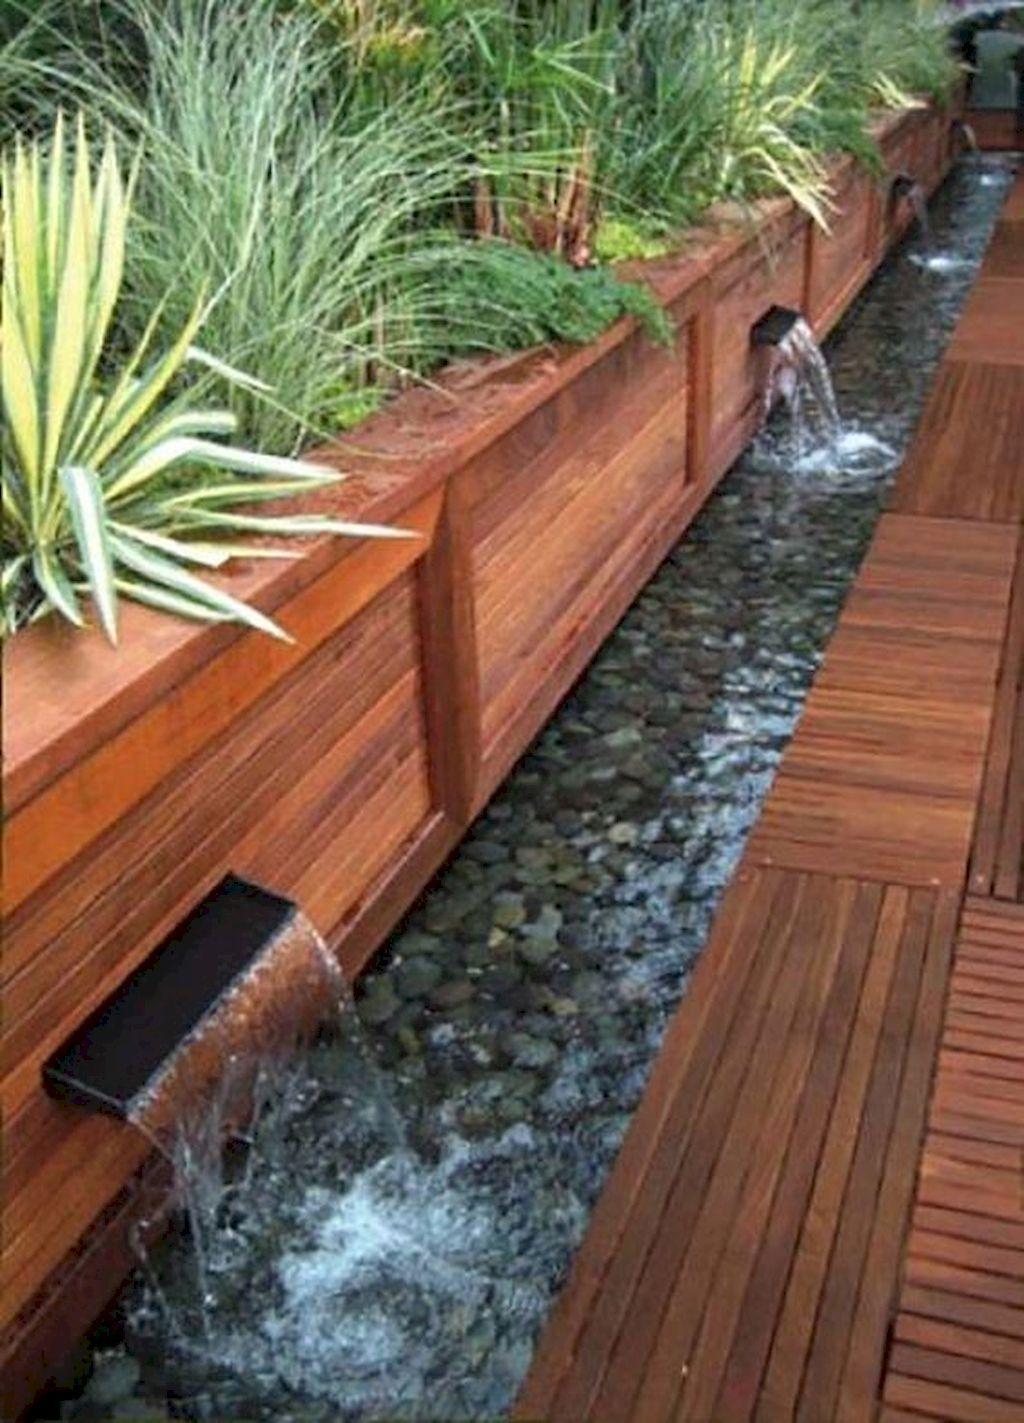 99 Graceful Backyard Waterfall Ideas on A Budget on Front Yard Waterfall Ideas id=53933